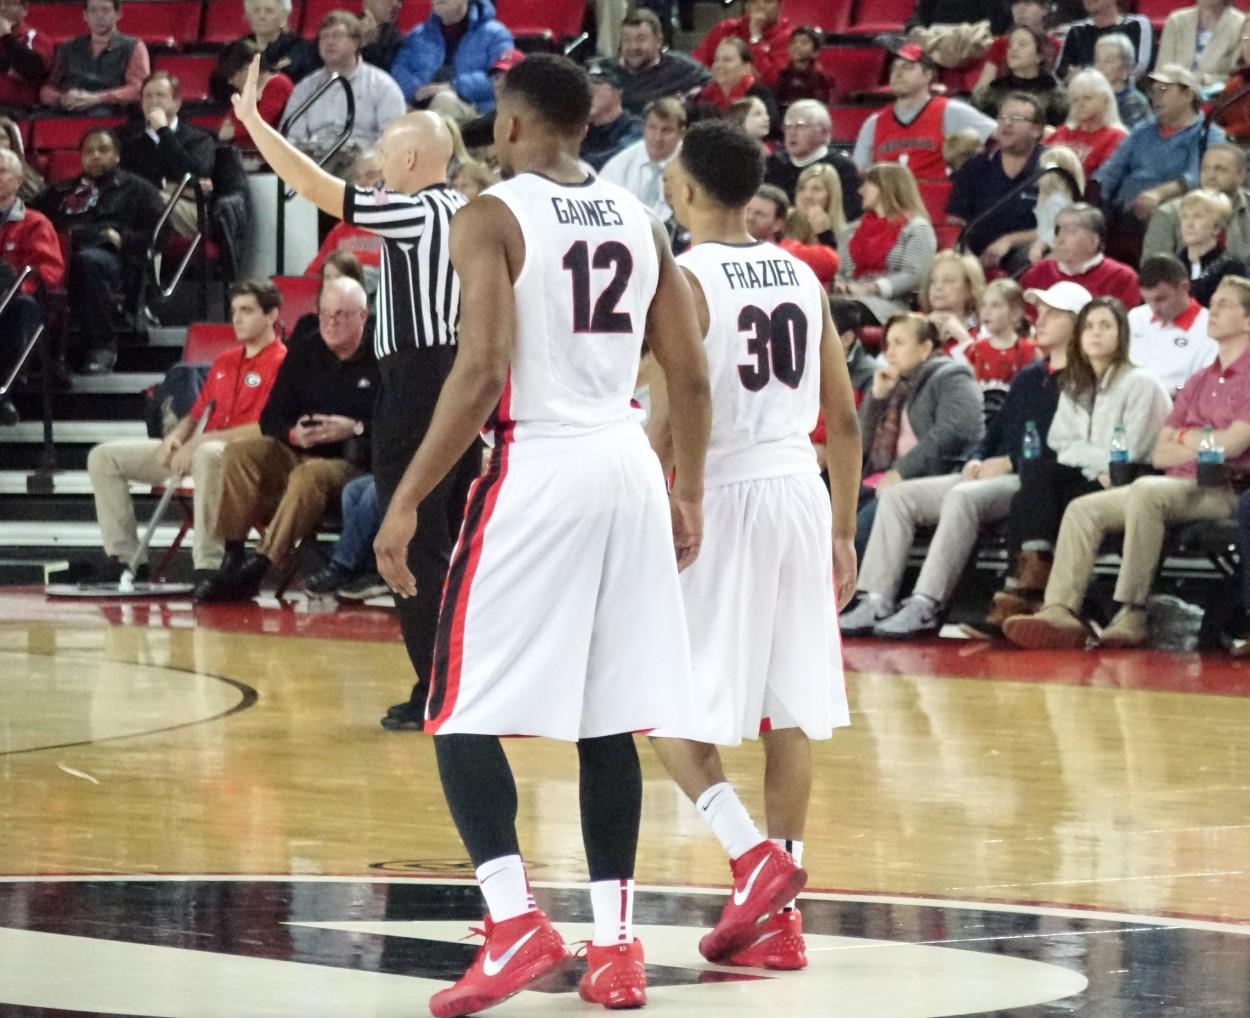 No.12 Kenny Gaines and No. 30 J.J. Fraizer Men's basketball - Missouri vs. UGA 06-JAN-2016 (Photo by Greg Poole/Bulldawg Illustrated)